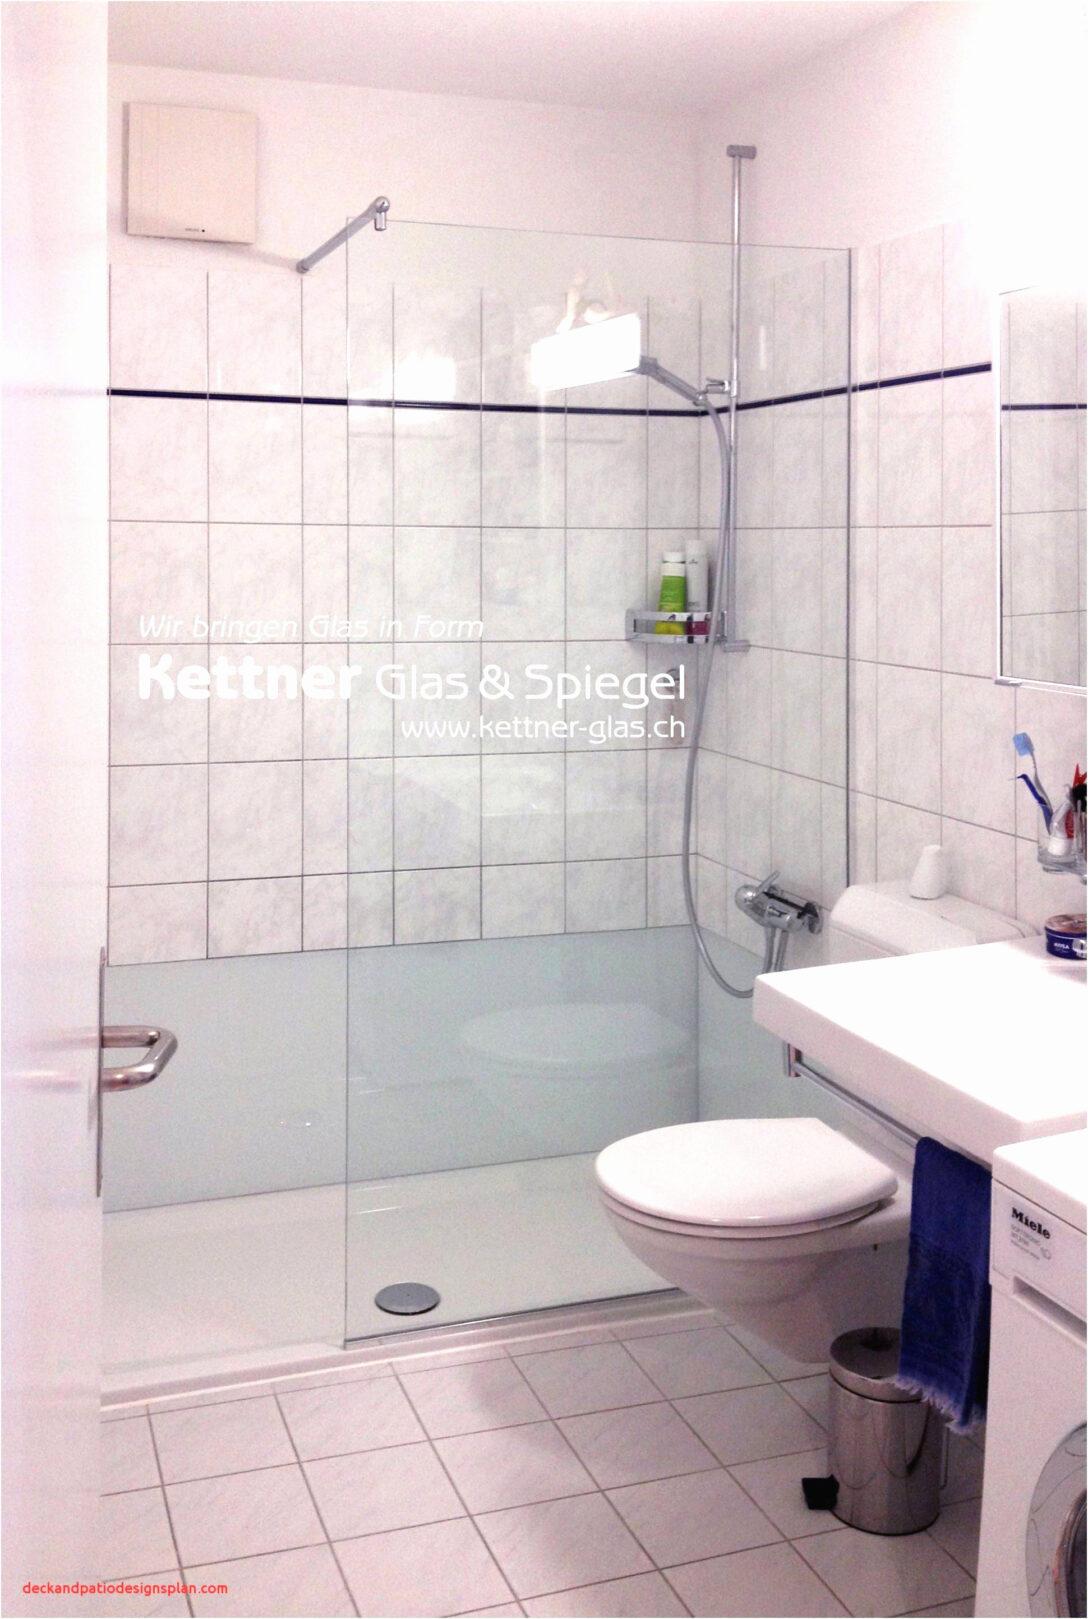 Large Size of Behindertengerechte Dusche Badezimmer Behindertengerecht Umbauen Grohe Thermostat Zuschuss Behindertengerechtes Bad Fliesen Glastrennwand Walkin Ebenerdig Dusche Behindertengerechte Dusche